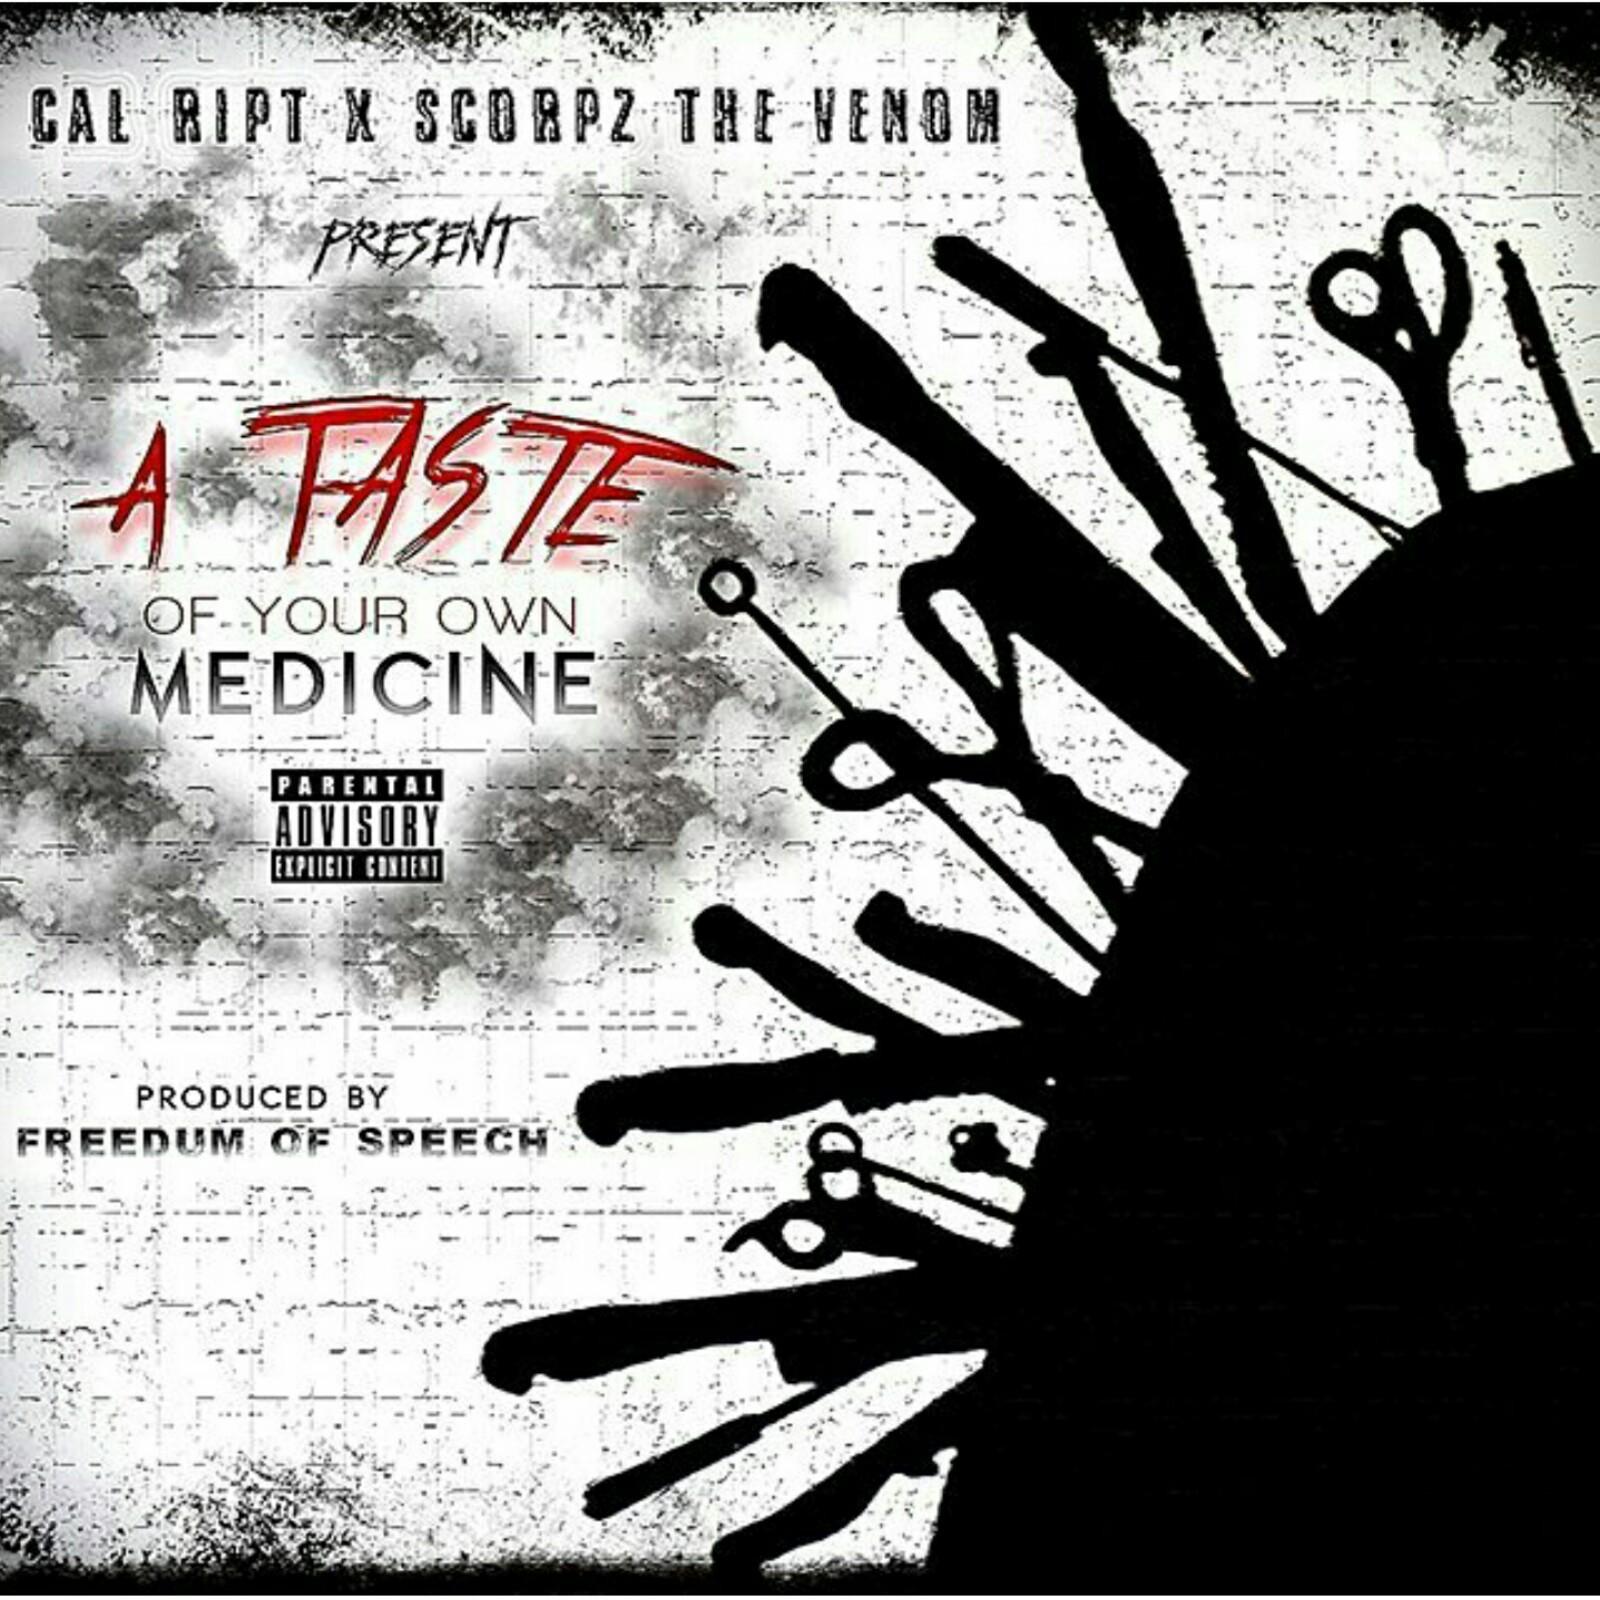 A Taste of Your Own Medicine (feat. Scorpz the Venom) - Single